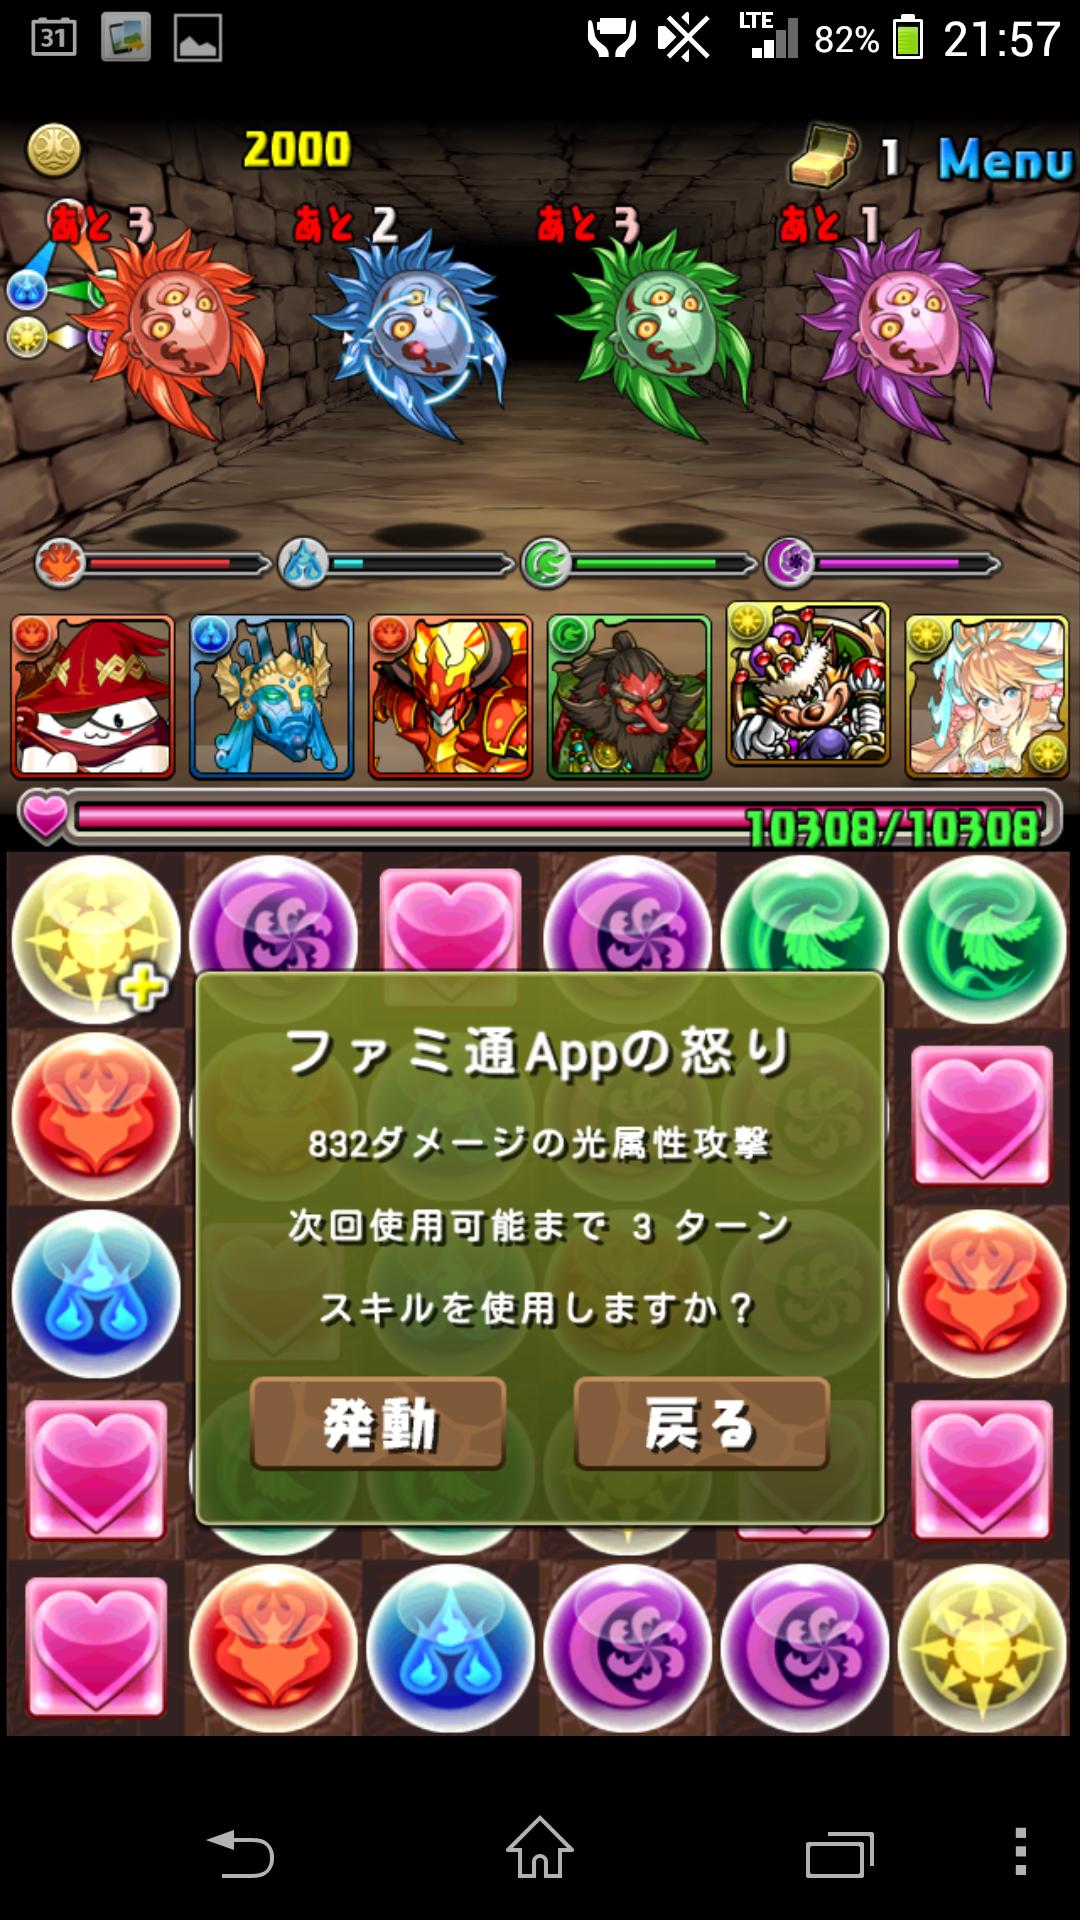 Screenshot_2014-05-12-21-57-52.png